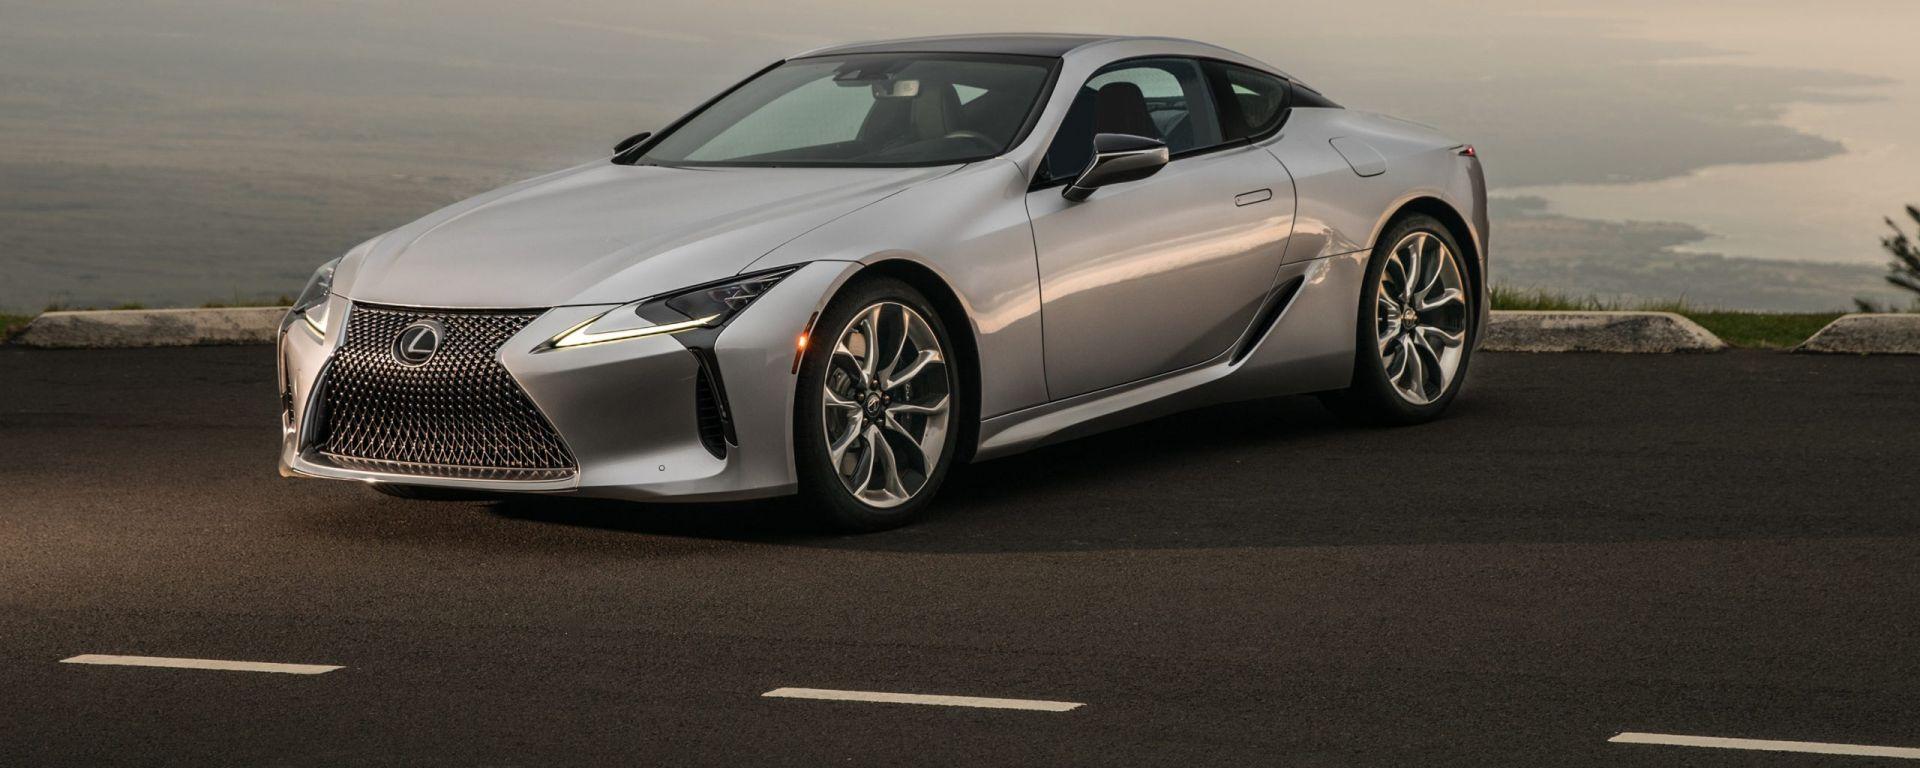 Nuova Lexus LC: dettaglio frontale